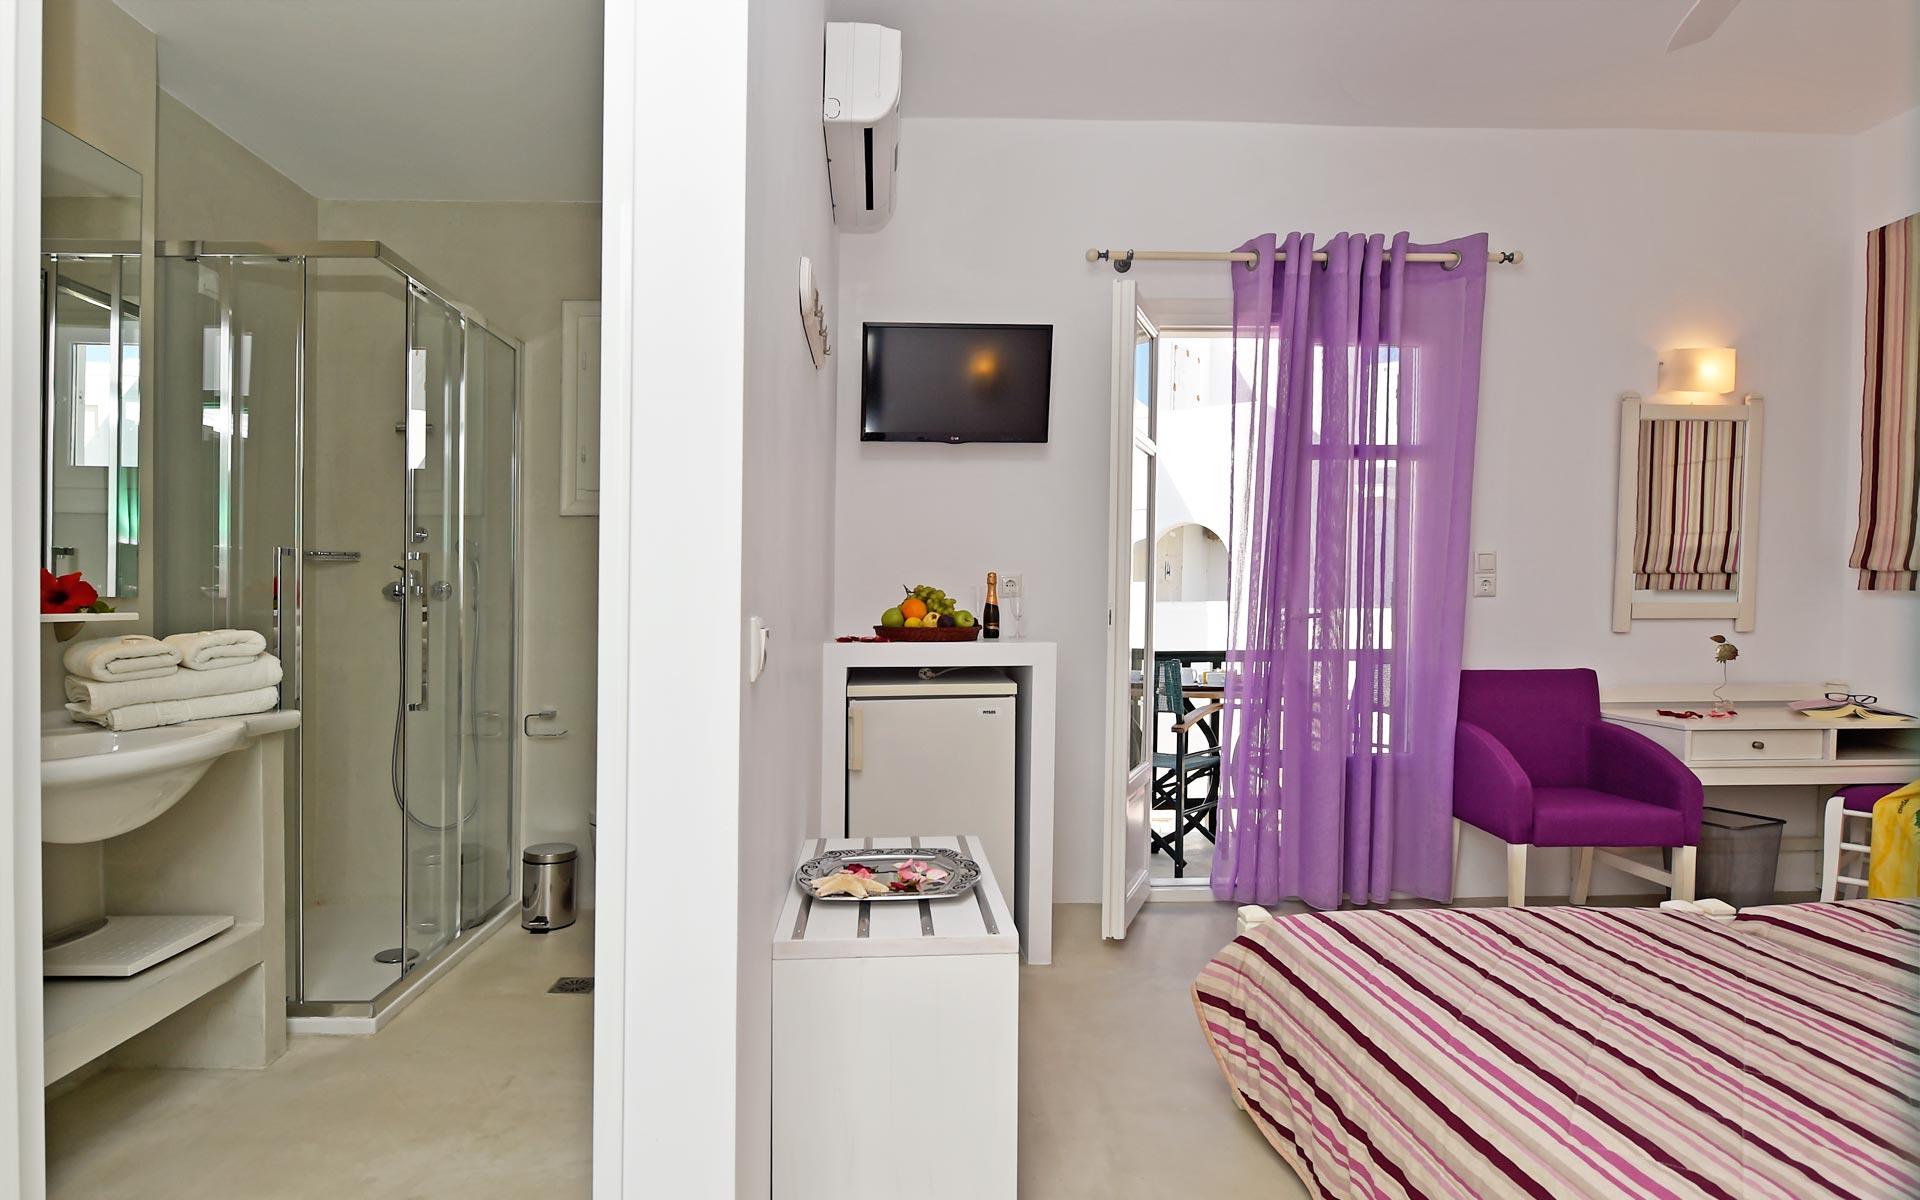 01kalypsohotel-double-triple-rooms